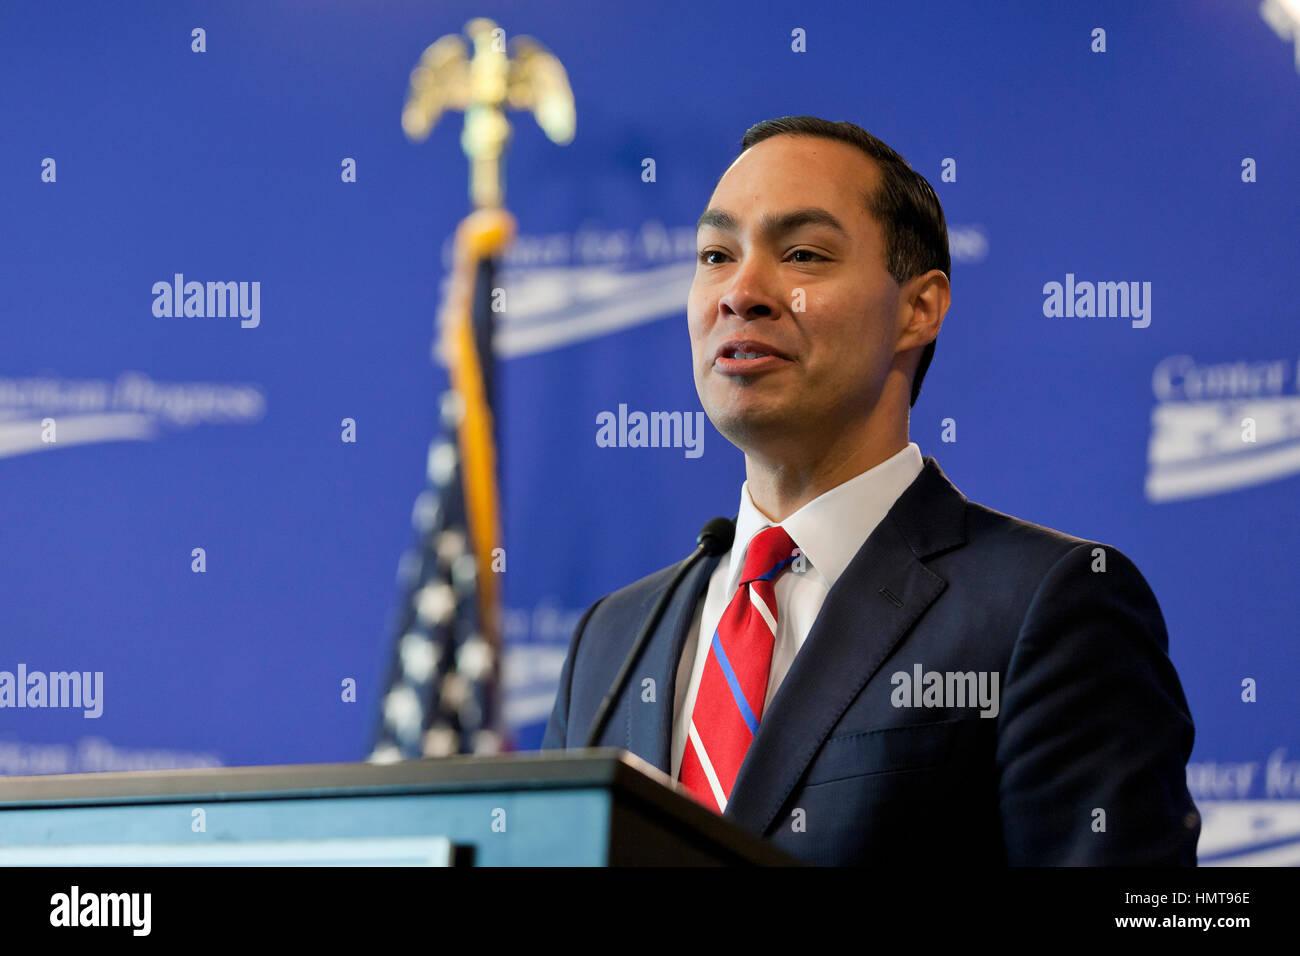 Julian Castro, Secretary of US Housing and Urban Development, 2014 to 2017. Stock Photo